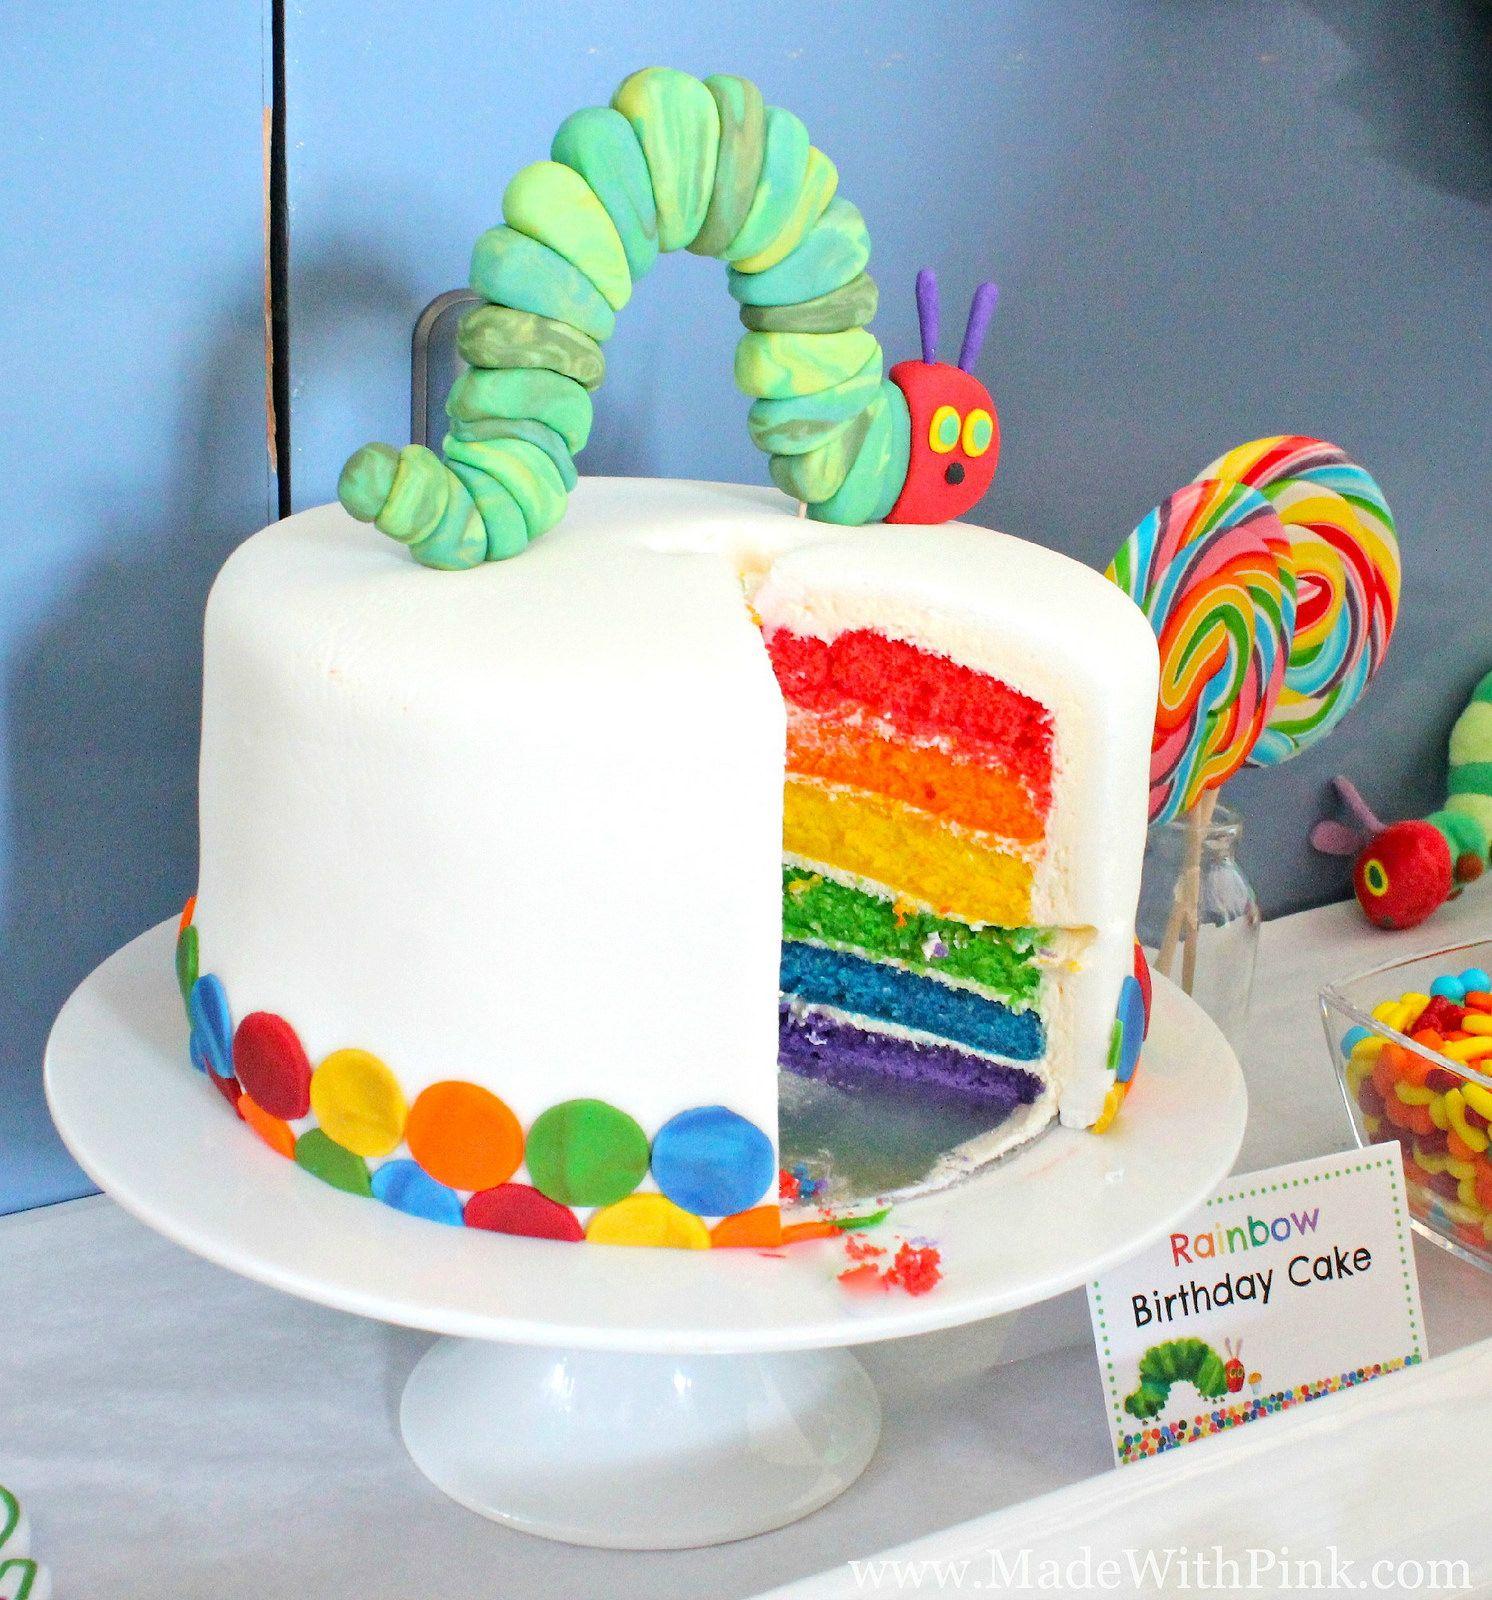 Groovy A Very Hungry Caterpillar Birthday Party Rainbow Cake Mit Personalised Birthday Cards Veneteletsinfo